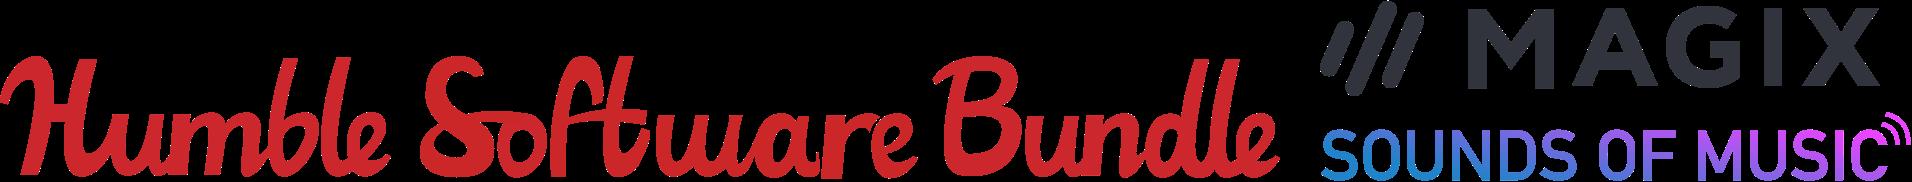 Humble Software Bundle: MAGIX Sounds of Music